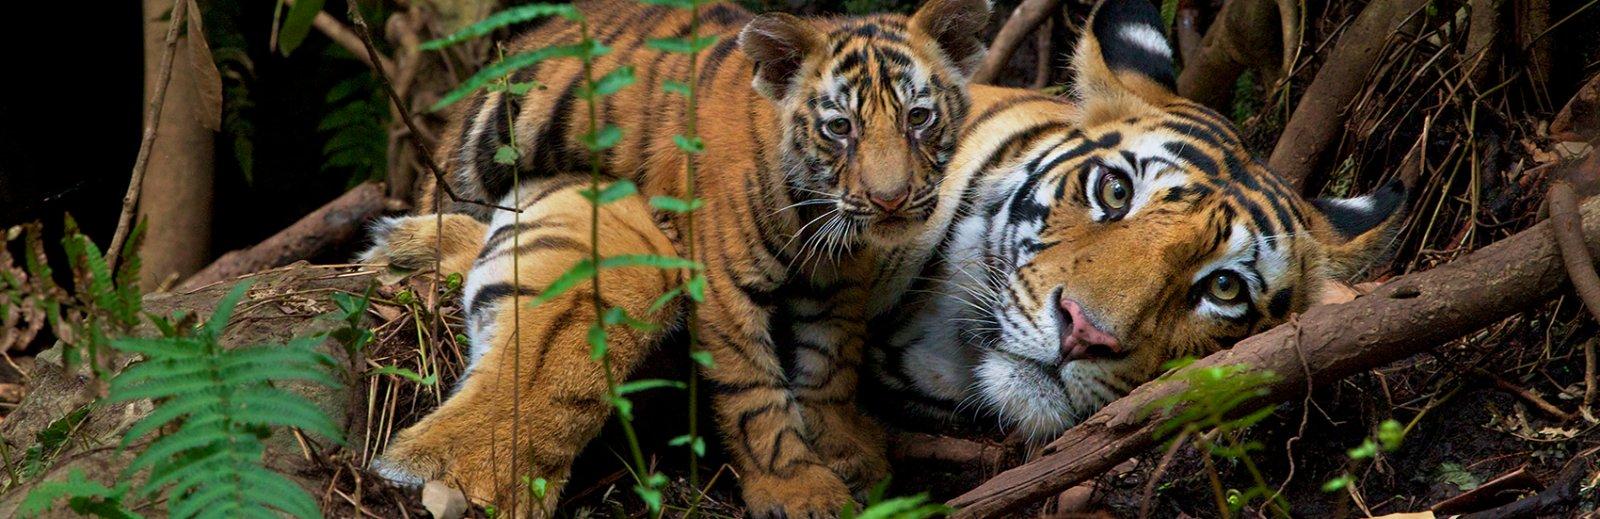 Name:  Tigers-Wide_1700x550.jpg Views: 59 Size:  212.1 KB